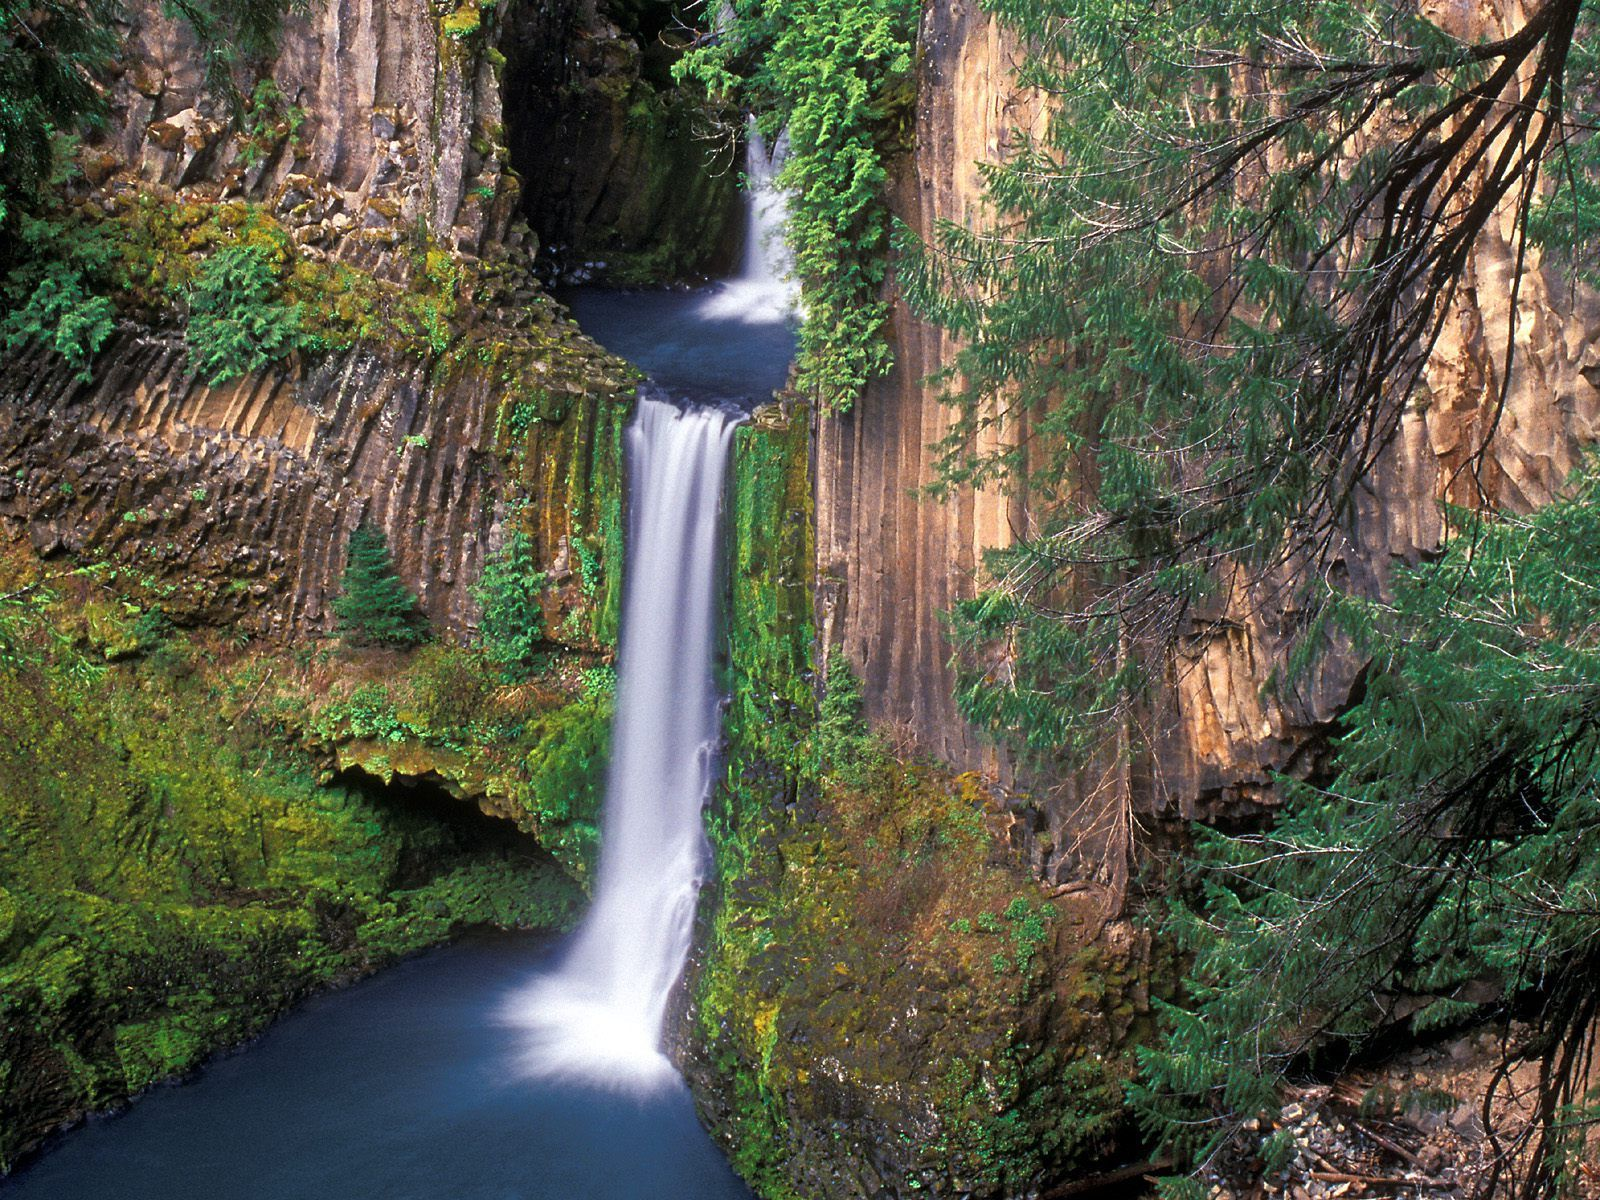 Oregon nature degin for a type of lake spirits - Oregon nature wallpaper ...